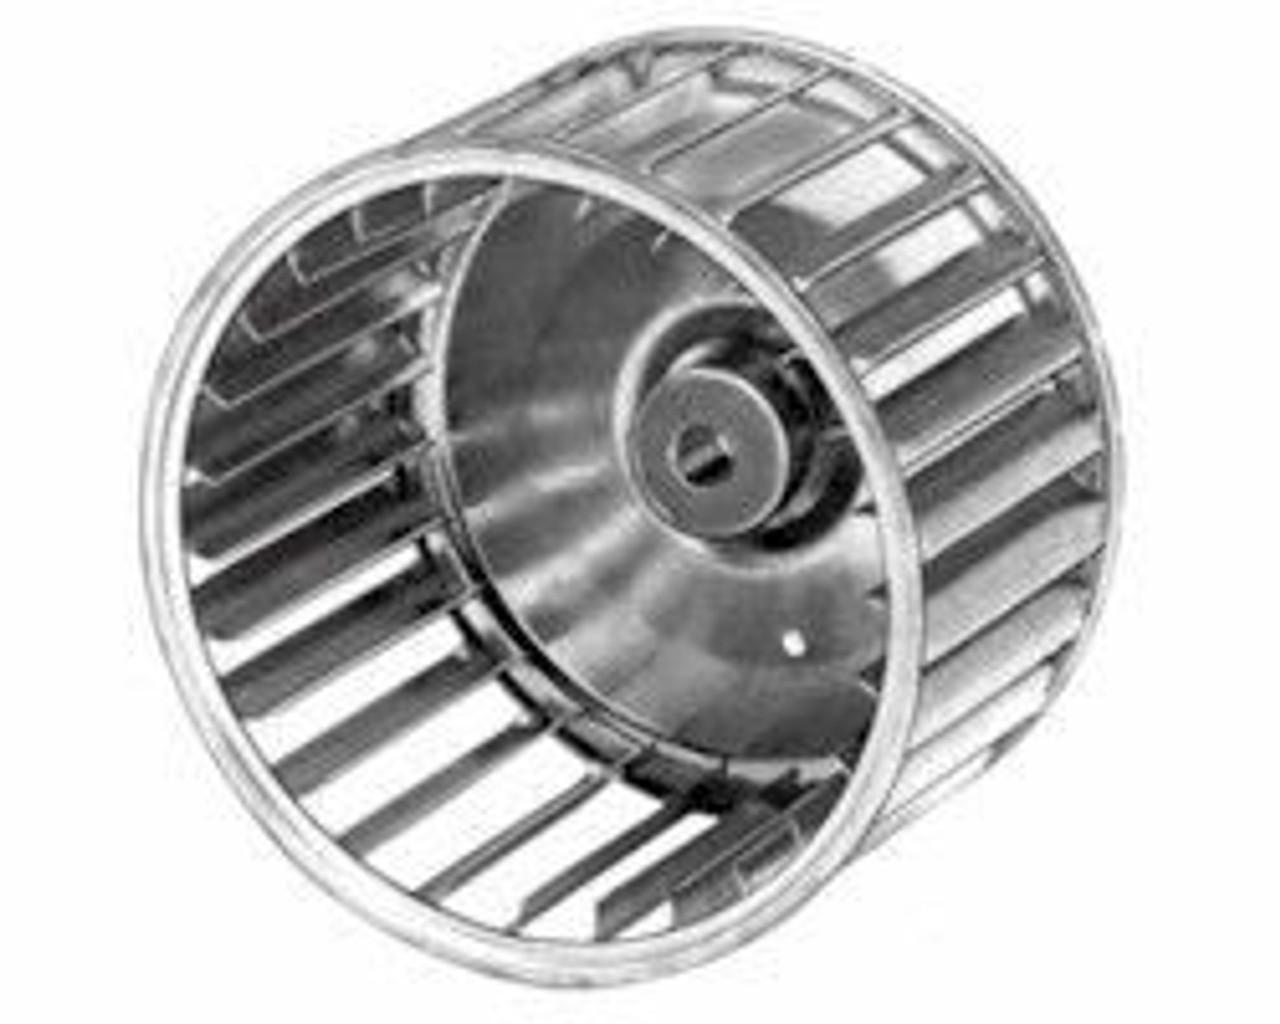 013511-10 Blower Wheel 9 15/16 Inch Diameter